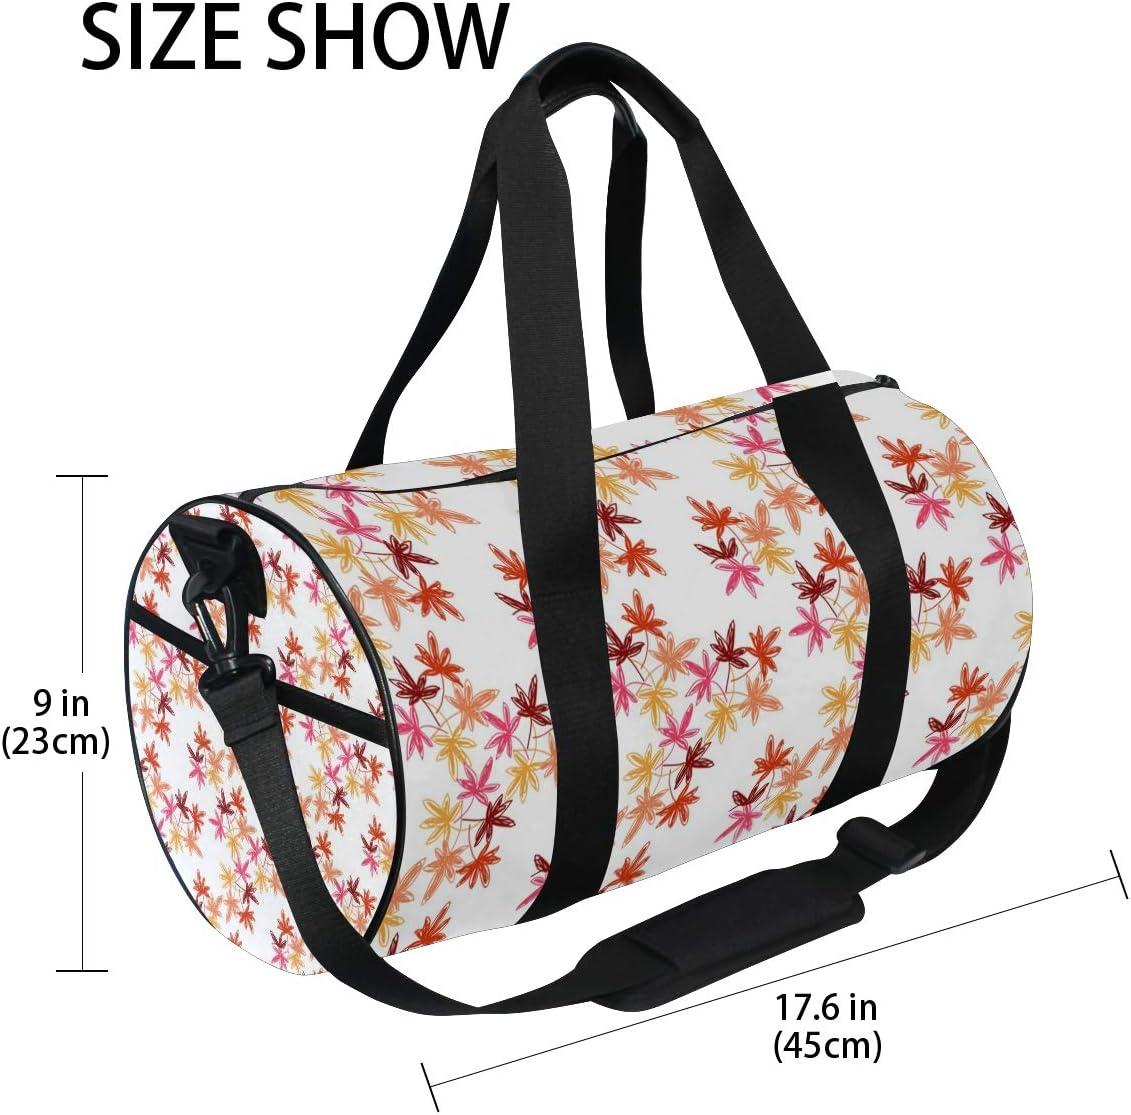 Duffel Bag AUTUMN LEAVES Women Garment Gym Tote Bag Best Sports Bag for Boys